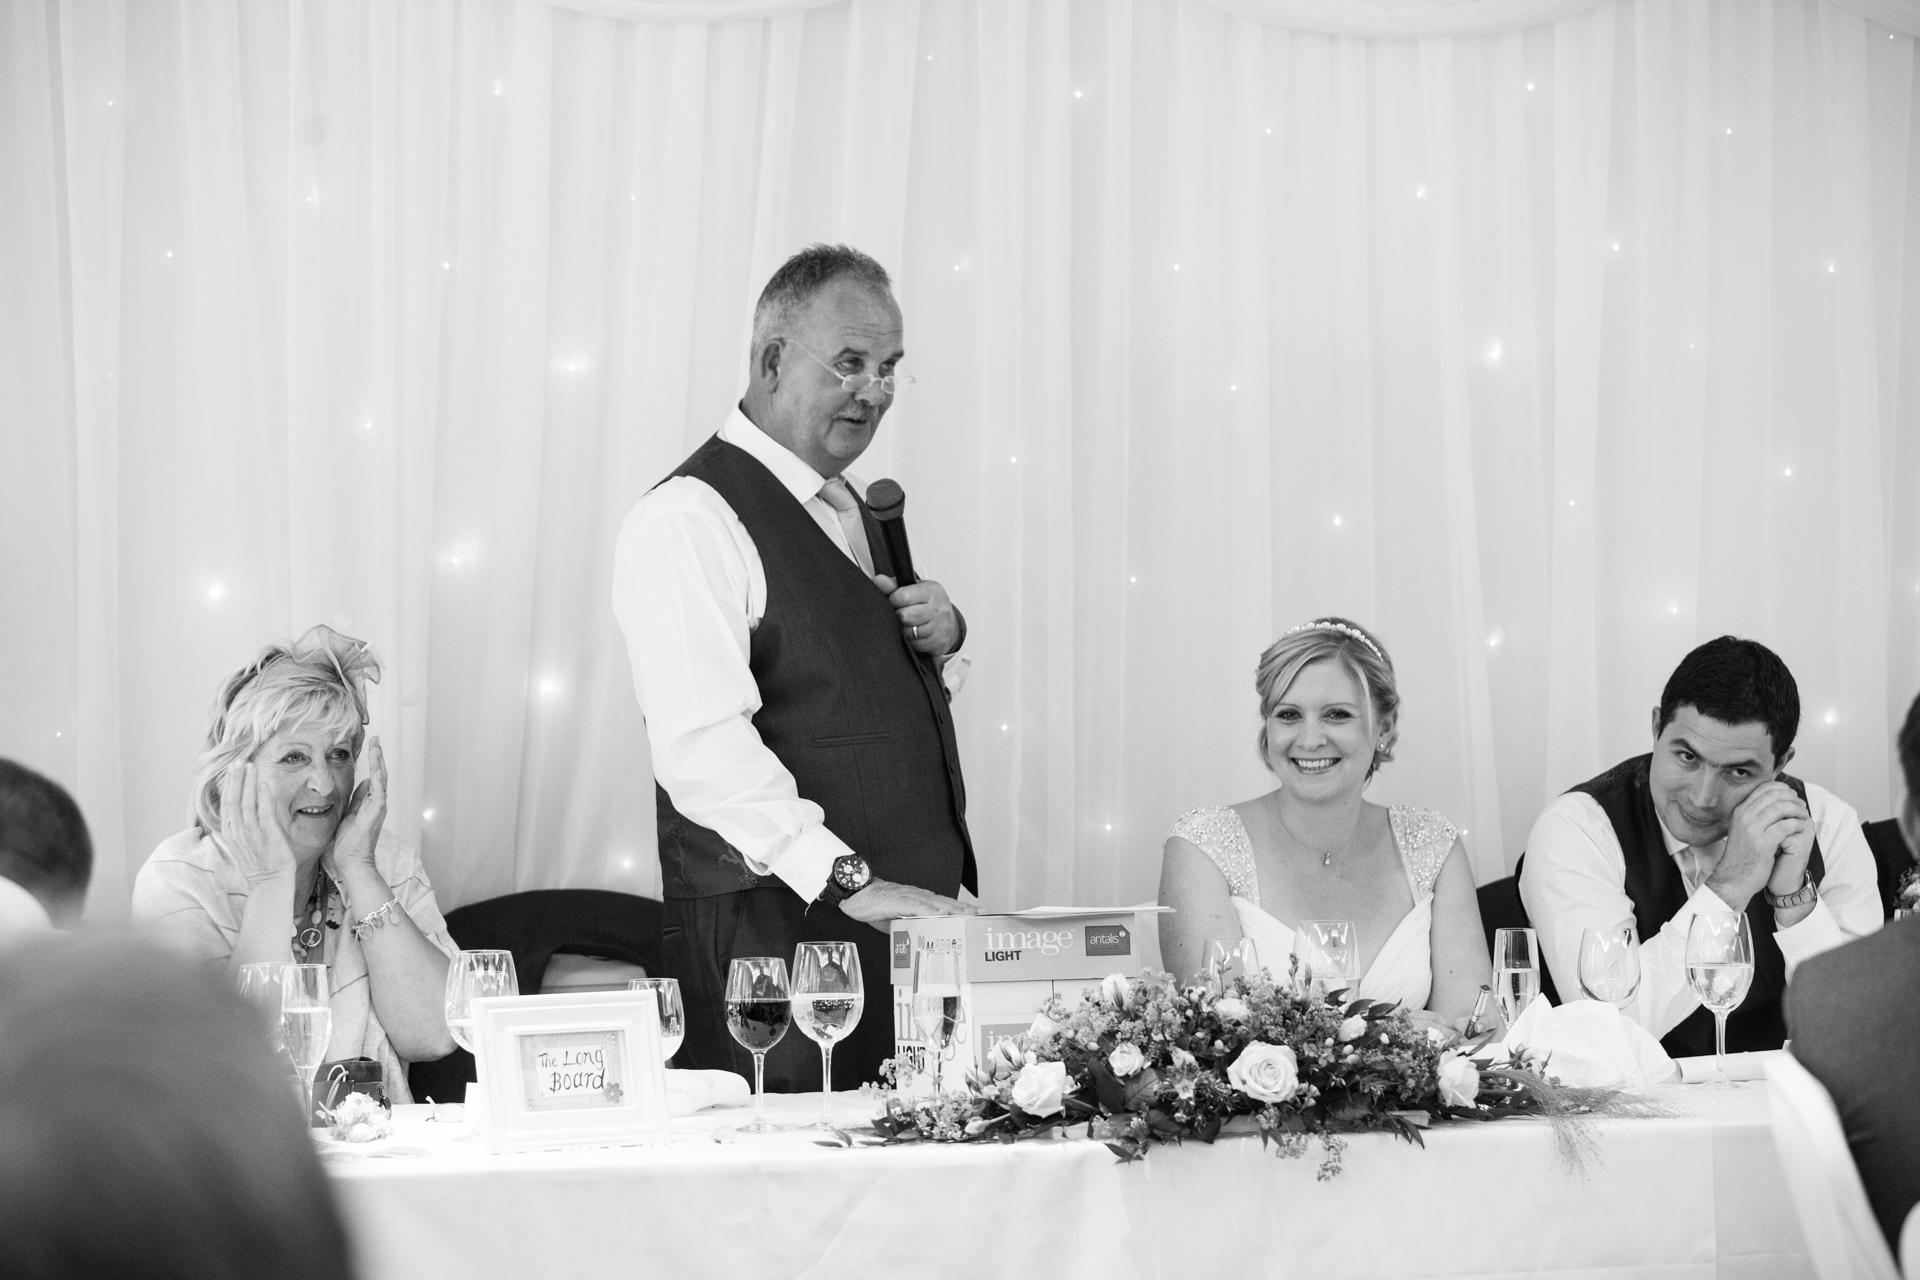 alexander house wedding photography,  sussex wedding photographer, speeches